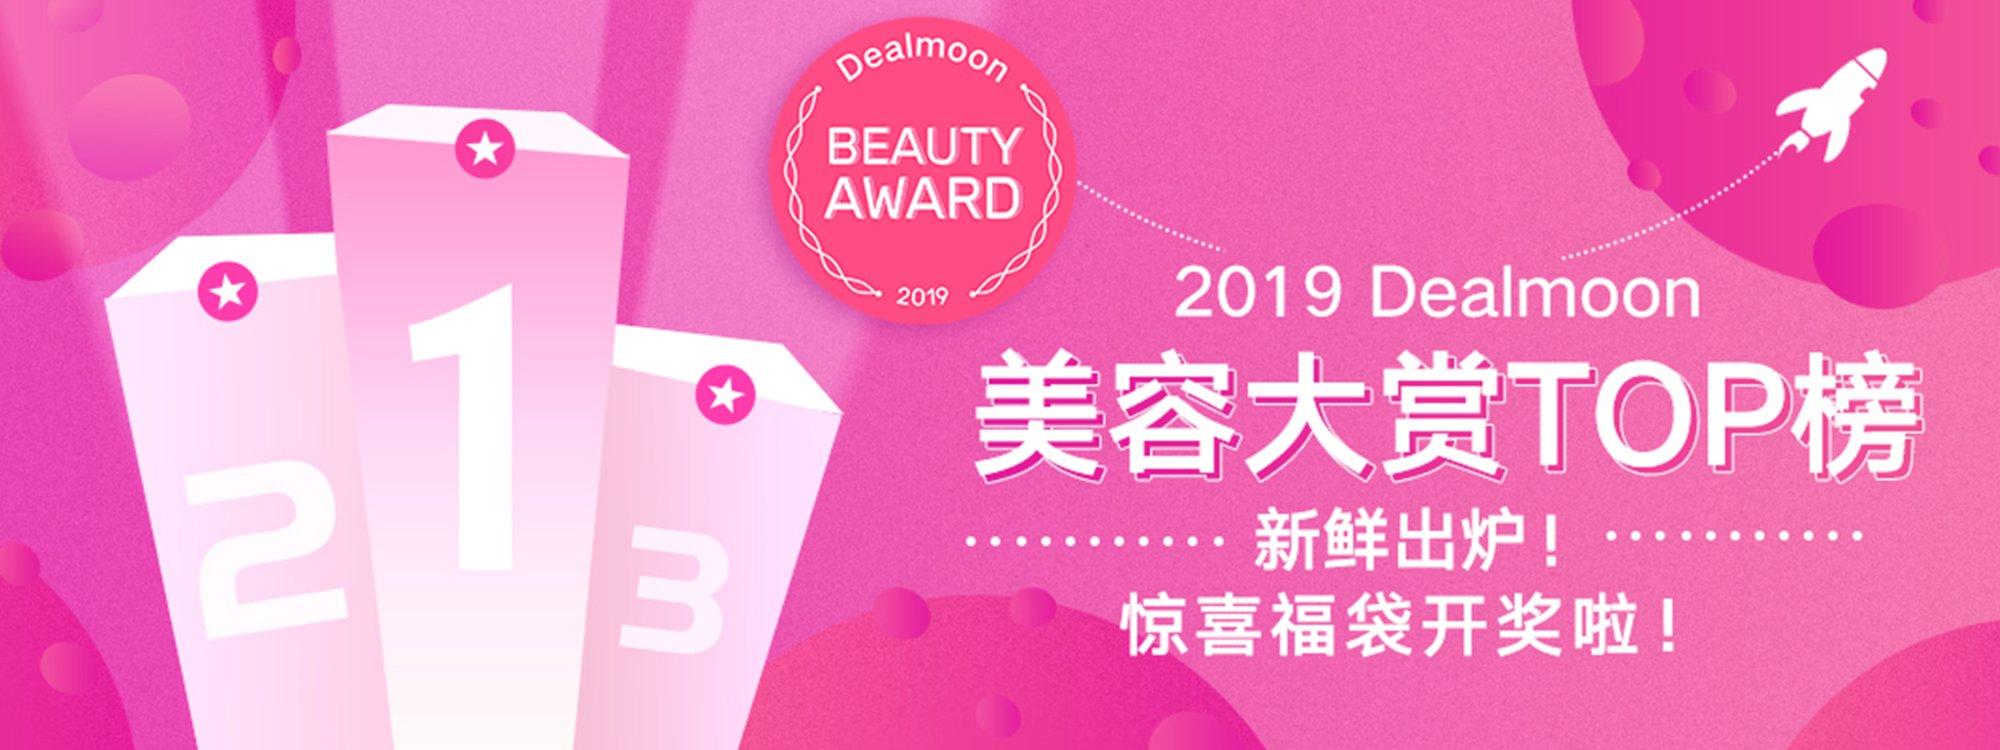 2019 Dealmoon美容大赏榜单公布啦!